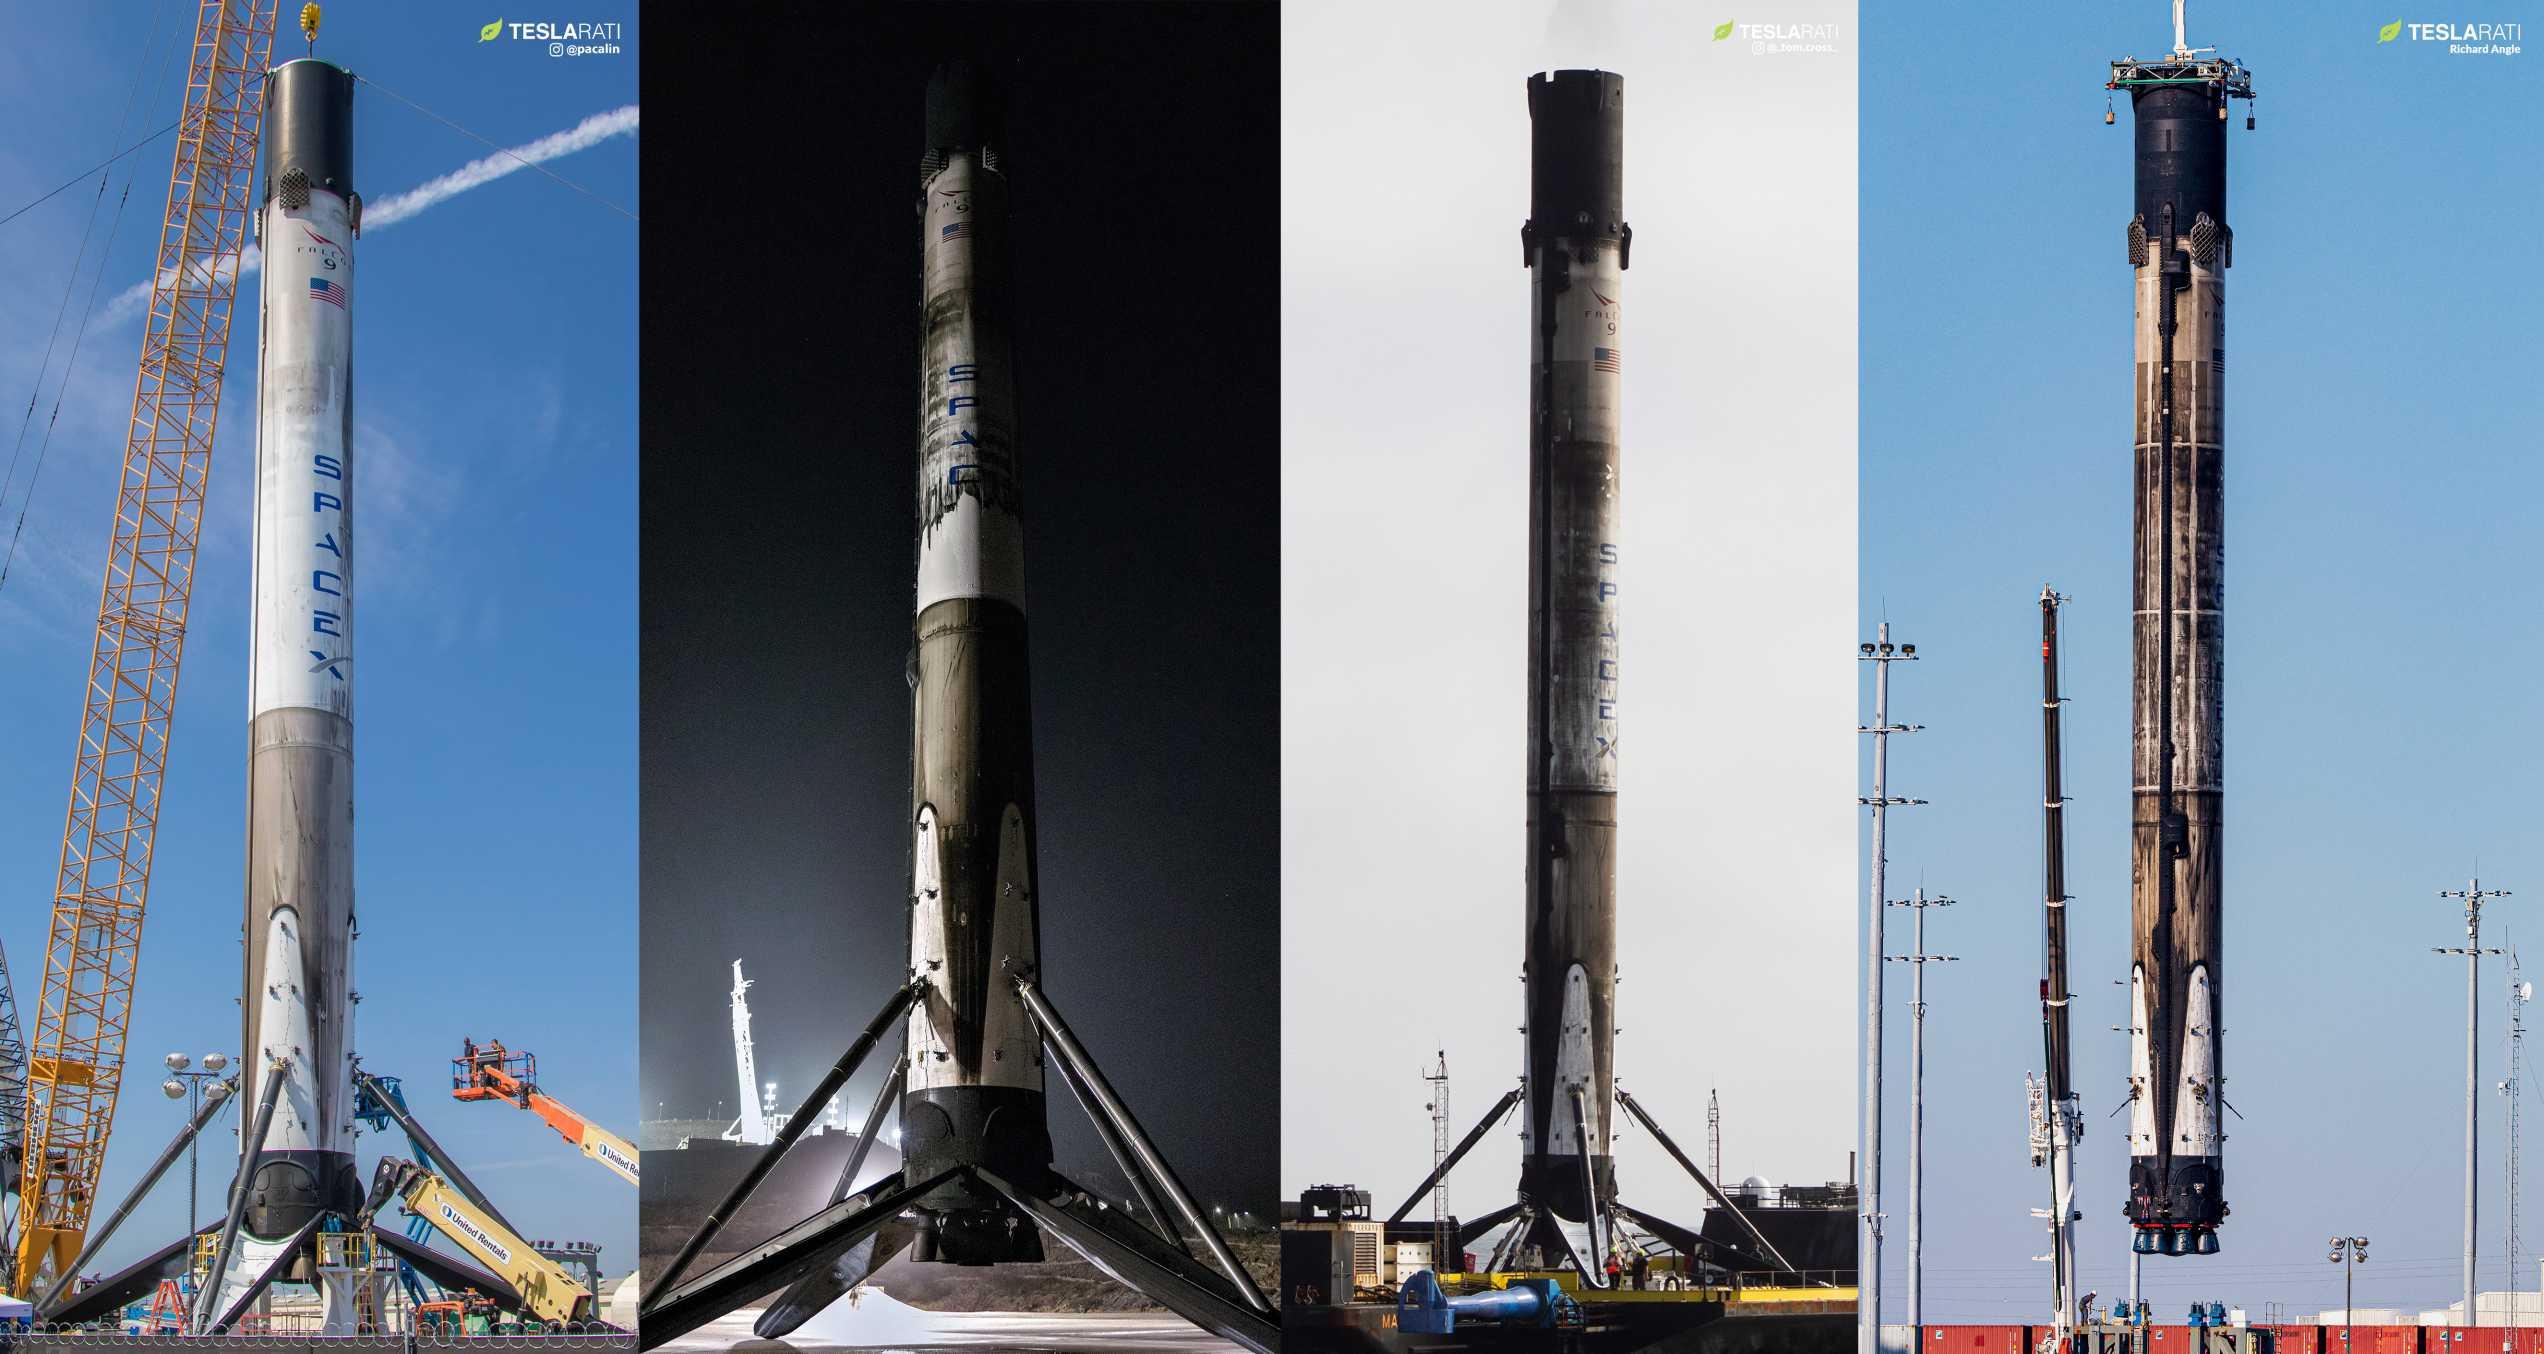 Falcon 9 B1048 career (Teslarati) Feb 2020 1 (c)